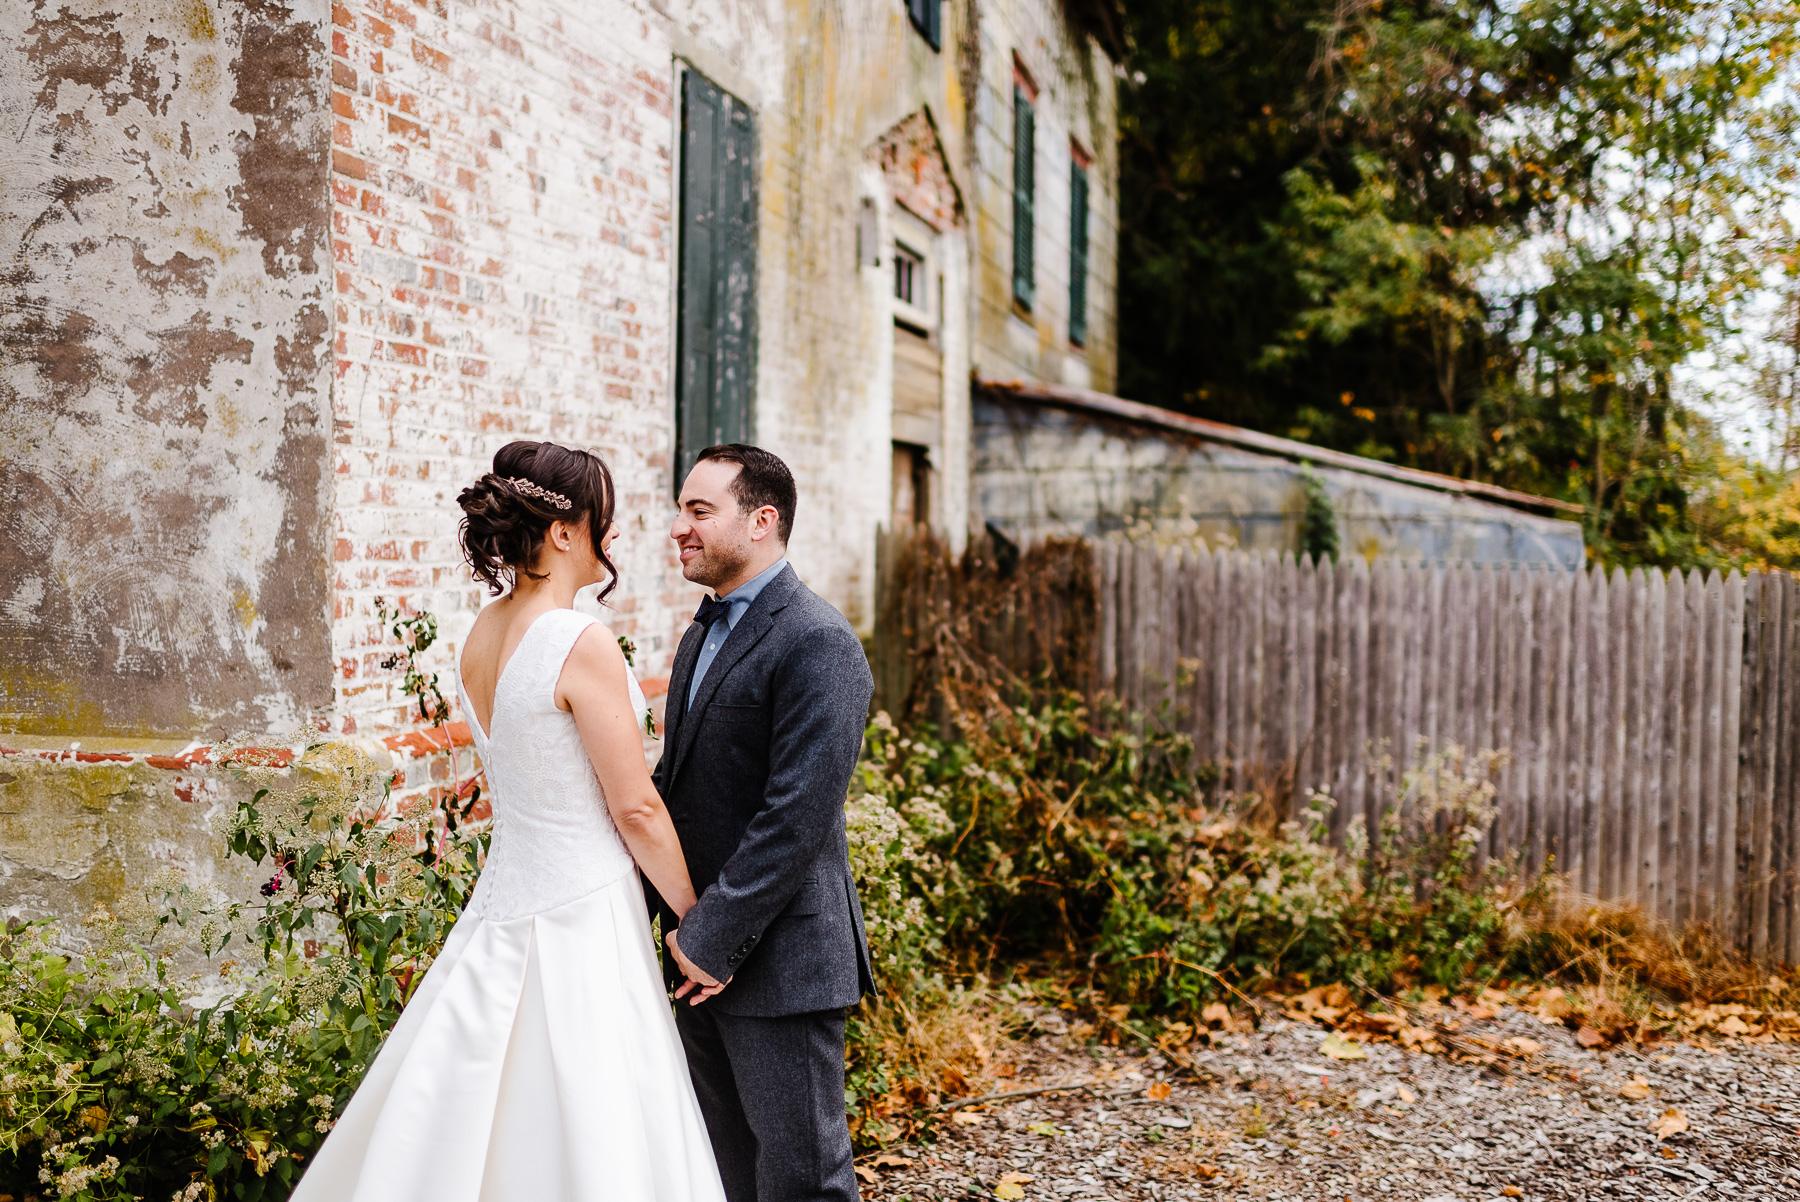 28-Laurita Winery Wedding New Jersey Wedding Photographer Laurita Winery Weddings Longbrook Photography.jpg